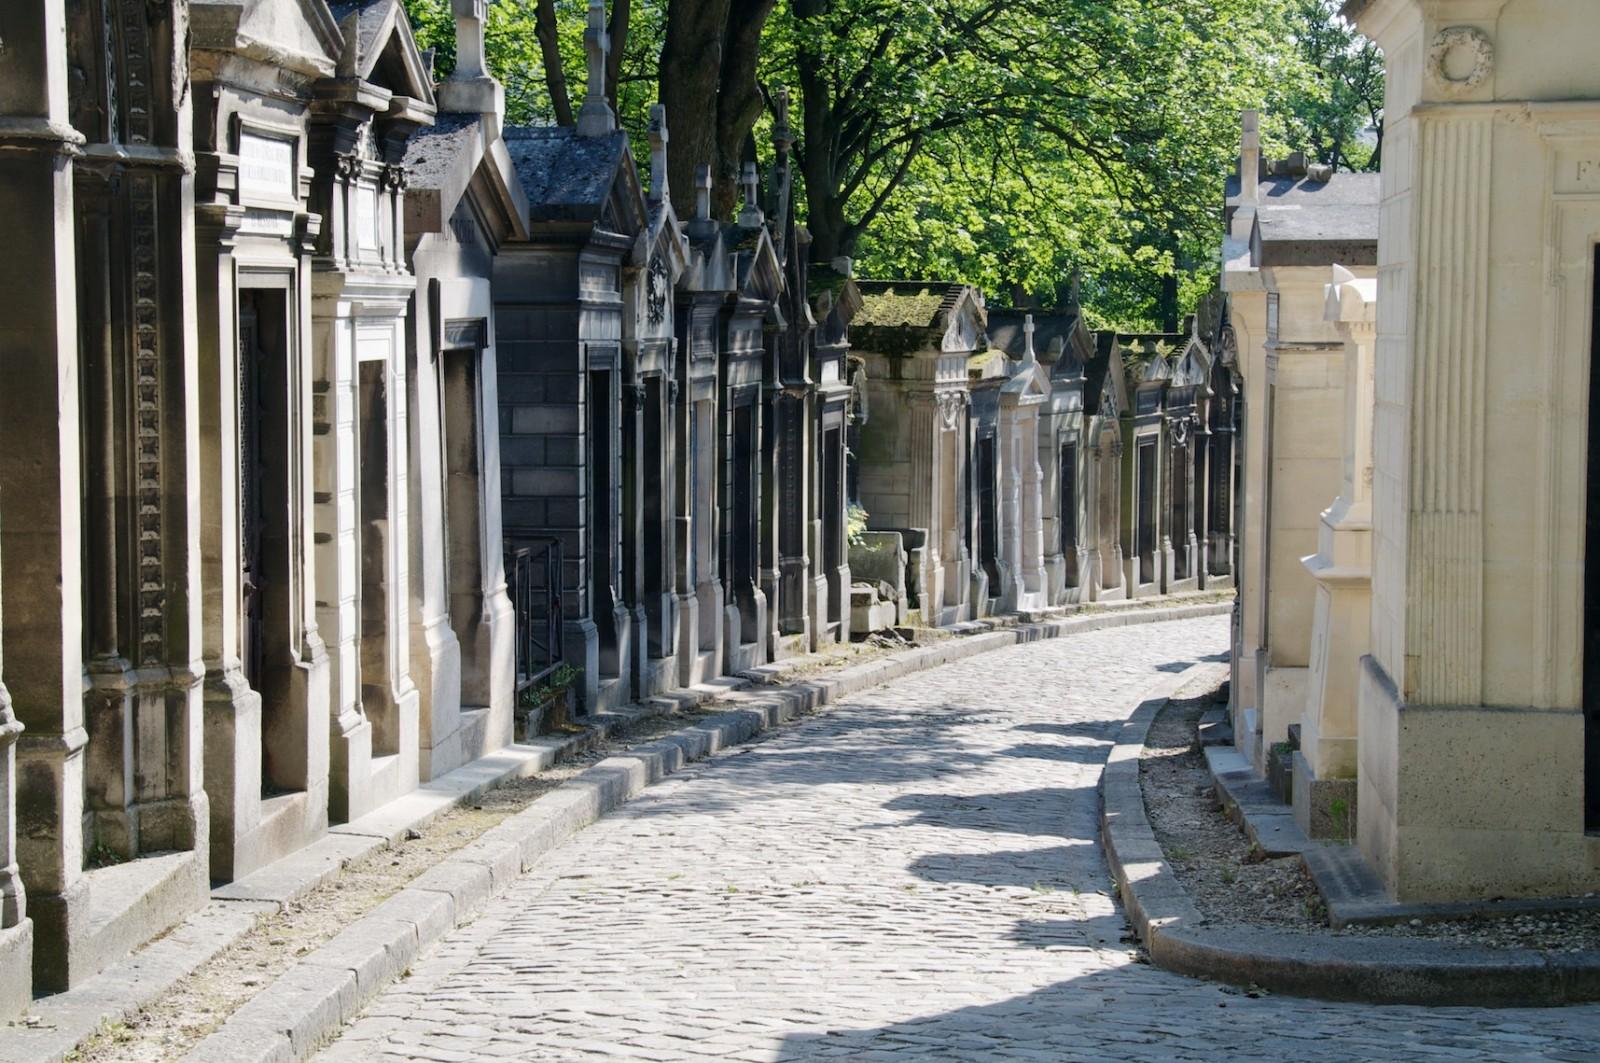 Pokopališče Père-Lachaise